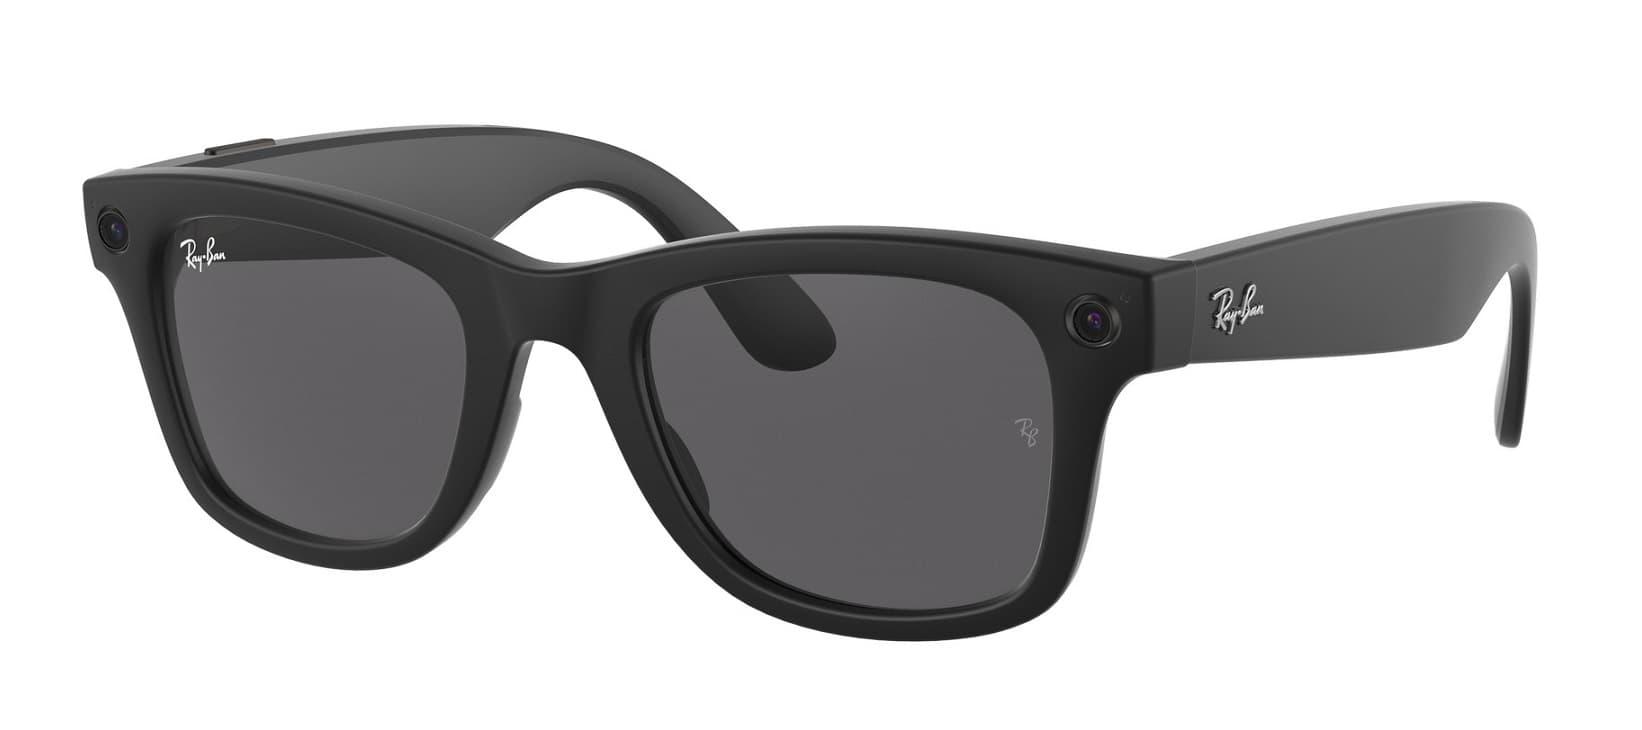 smart okulary Ray-Ban Stories